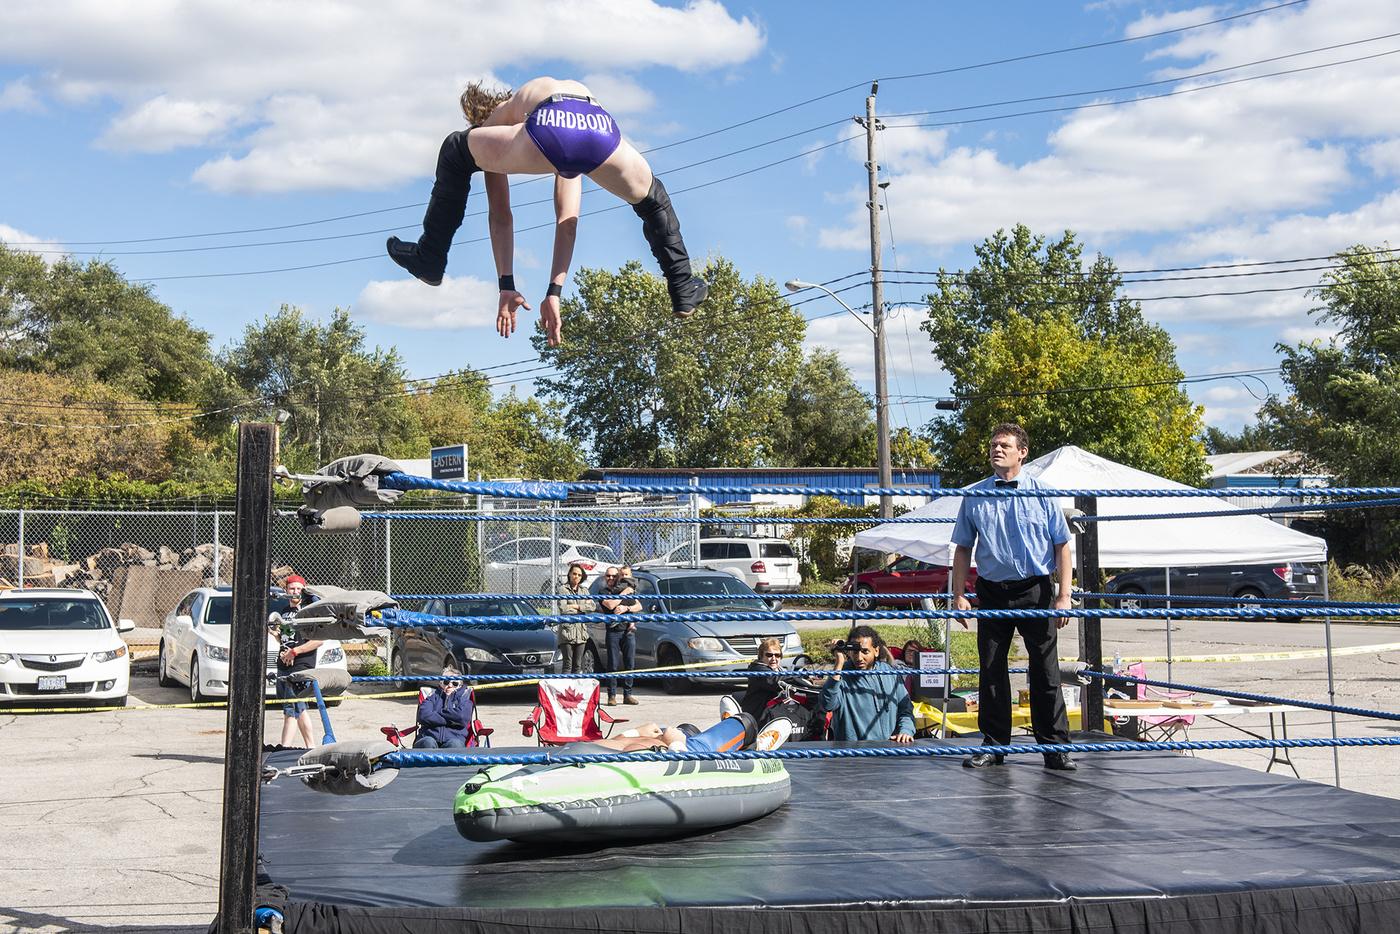 Wrestling Toronto